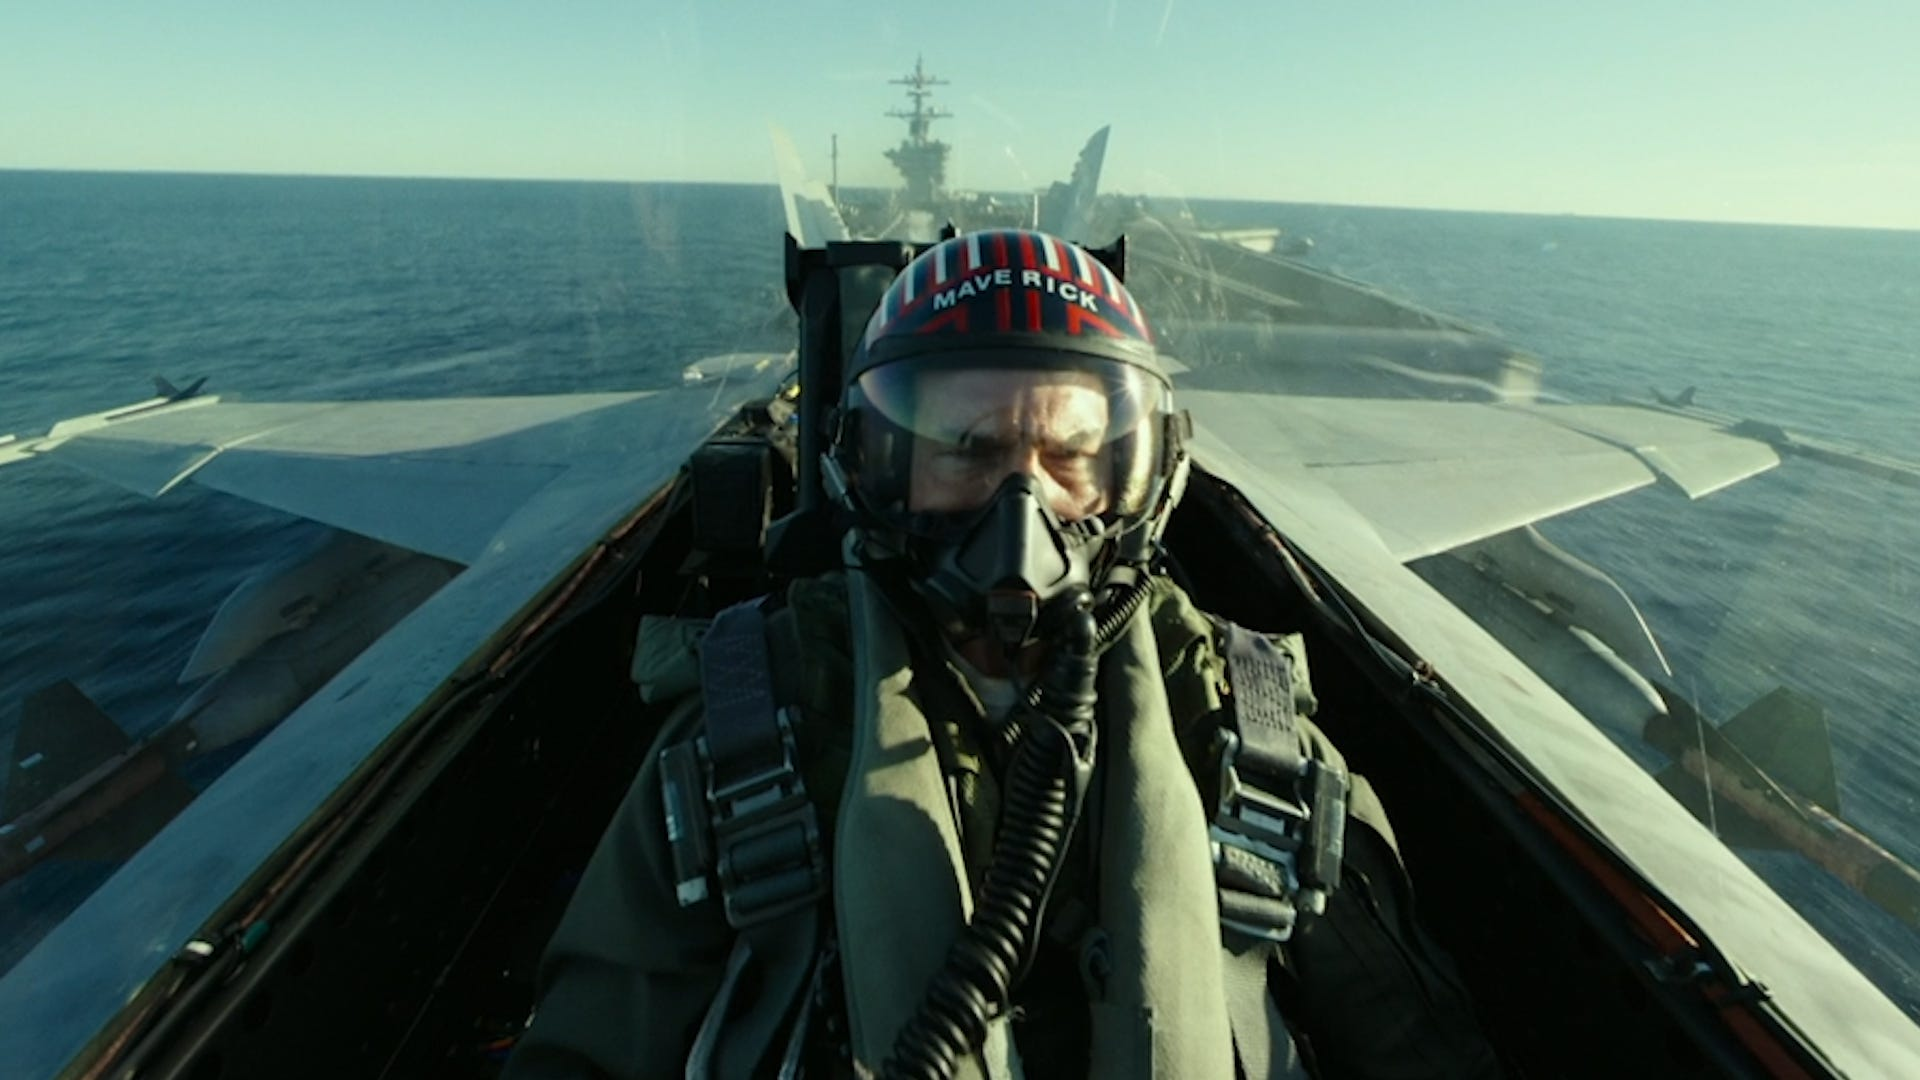 Navy shot down Tom Cruise s F-18 flying, but he still found speed in  Top Gun: Maverick